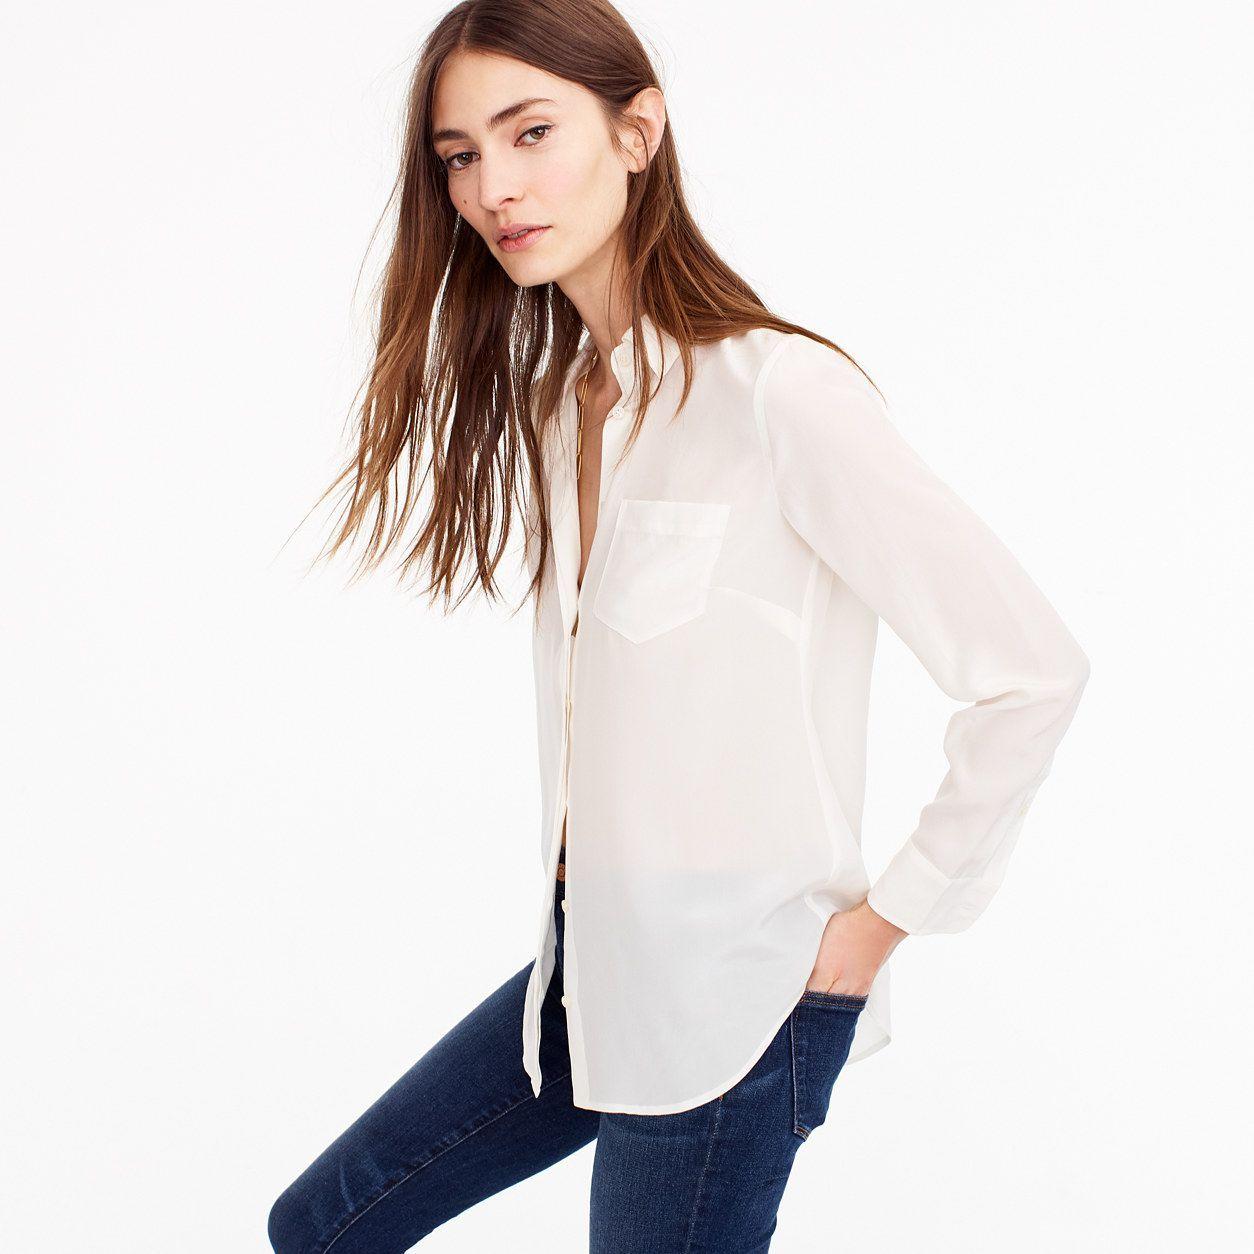 17586efabc3b8 J.Crew Womens Petite Silk Button-Up Shirt (Size 00 Petite ...